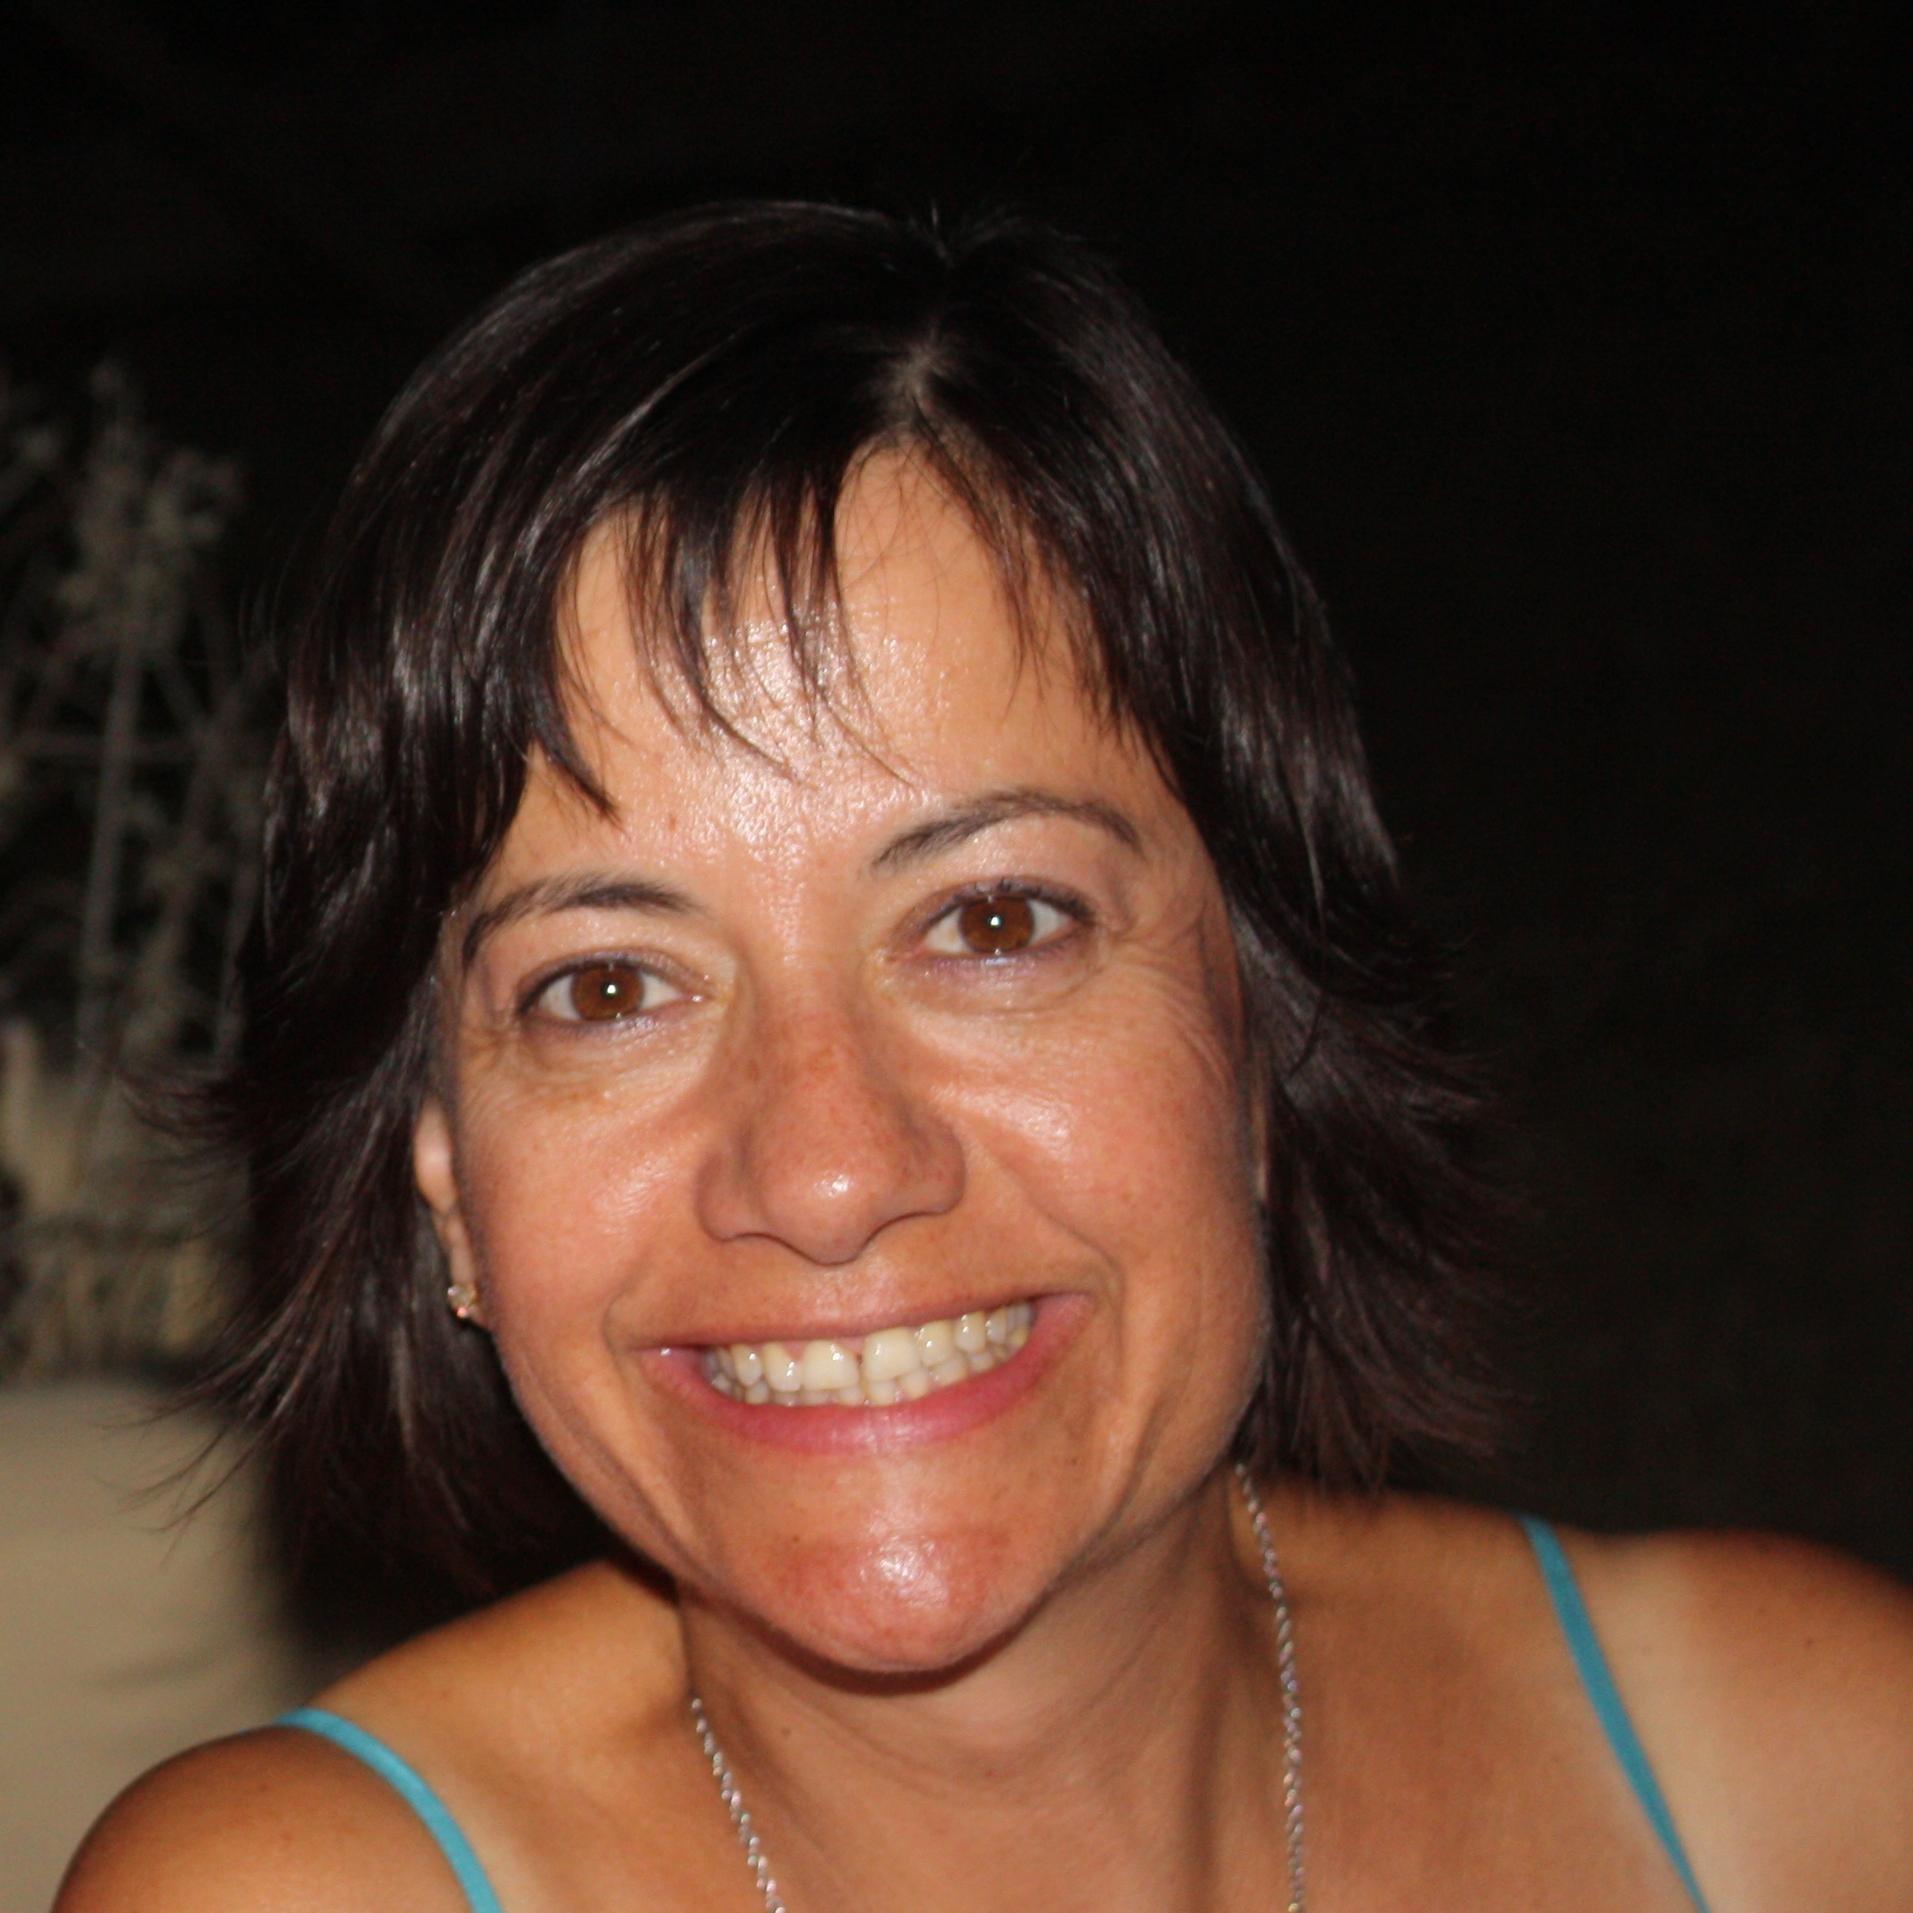 Xana Antunes